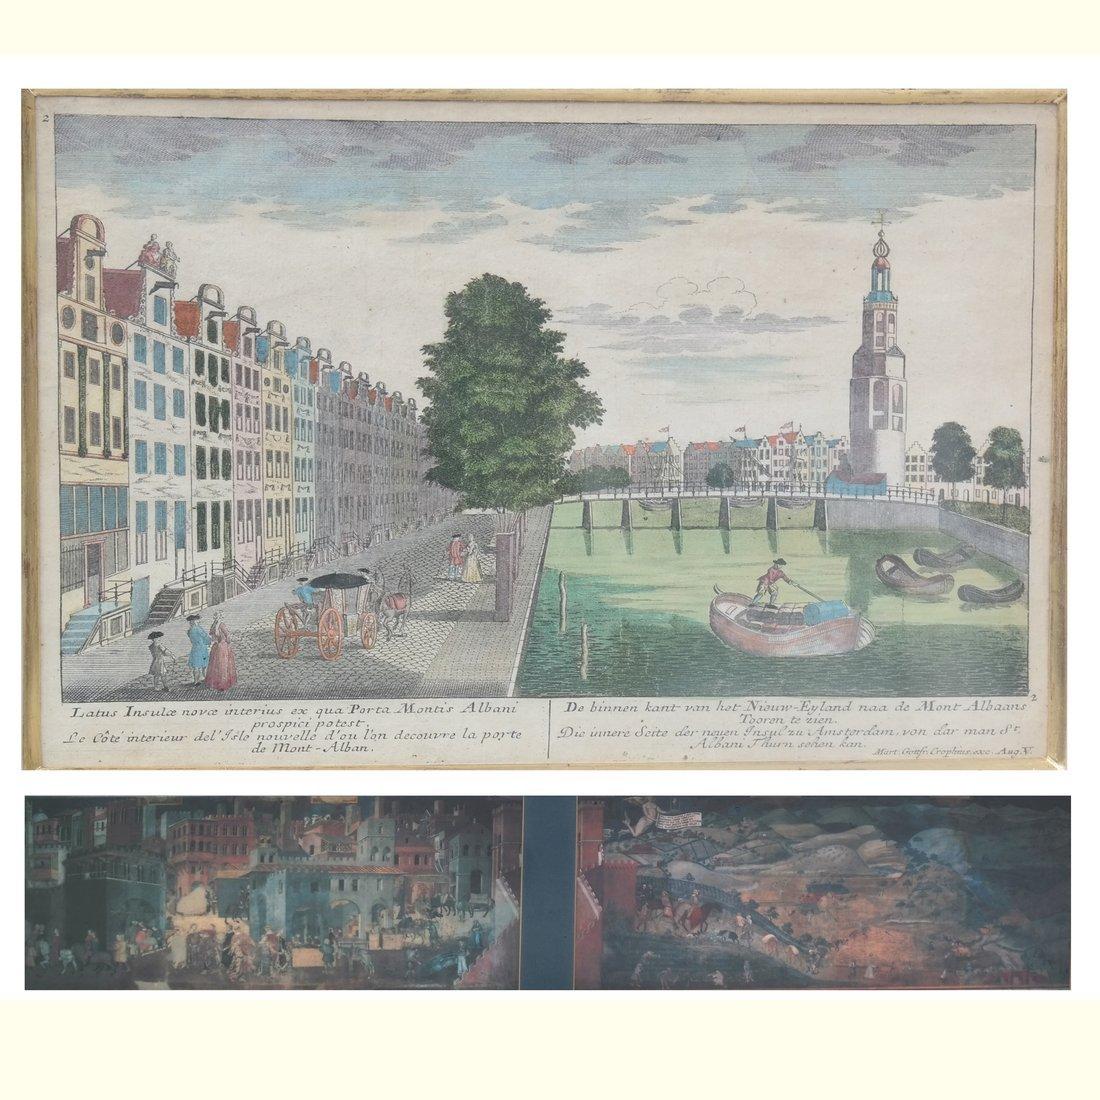 Two Prints Depicting Urban Scenes